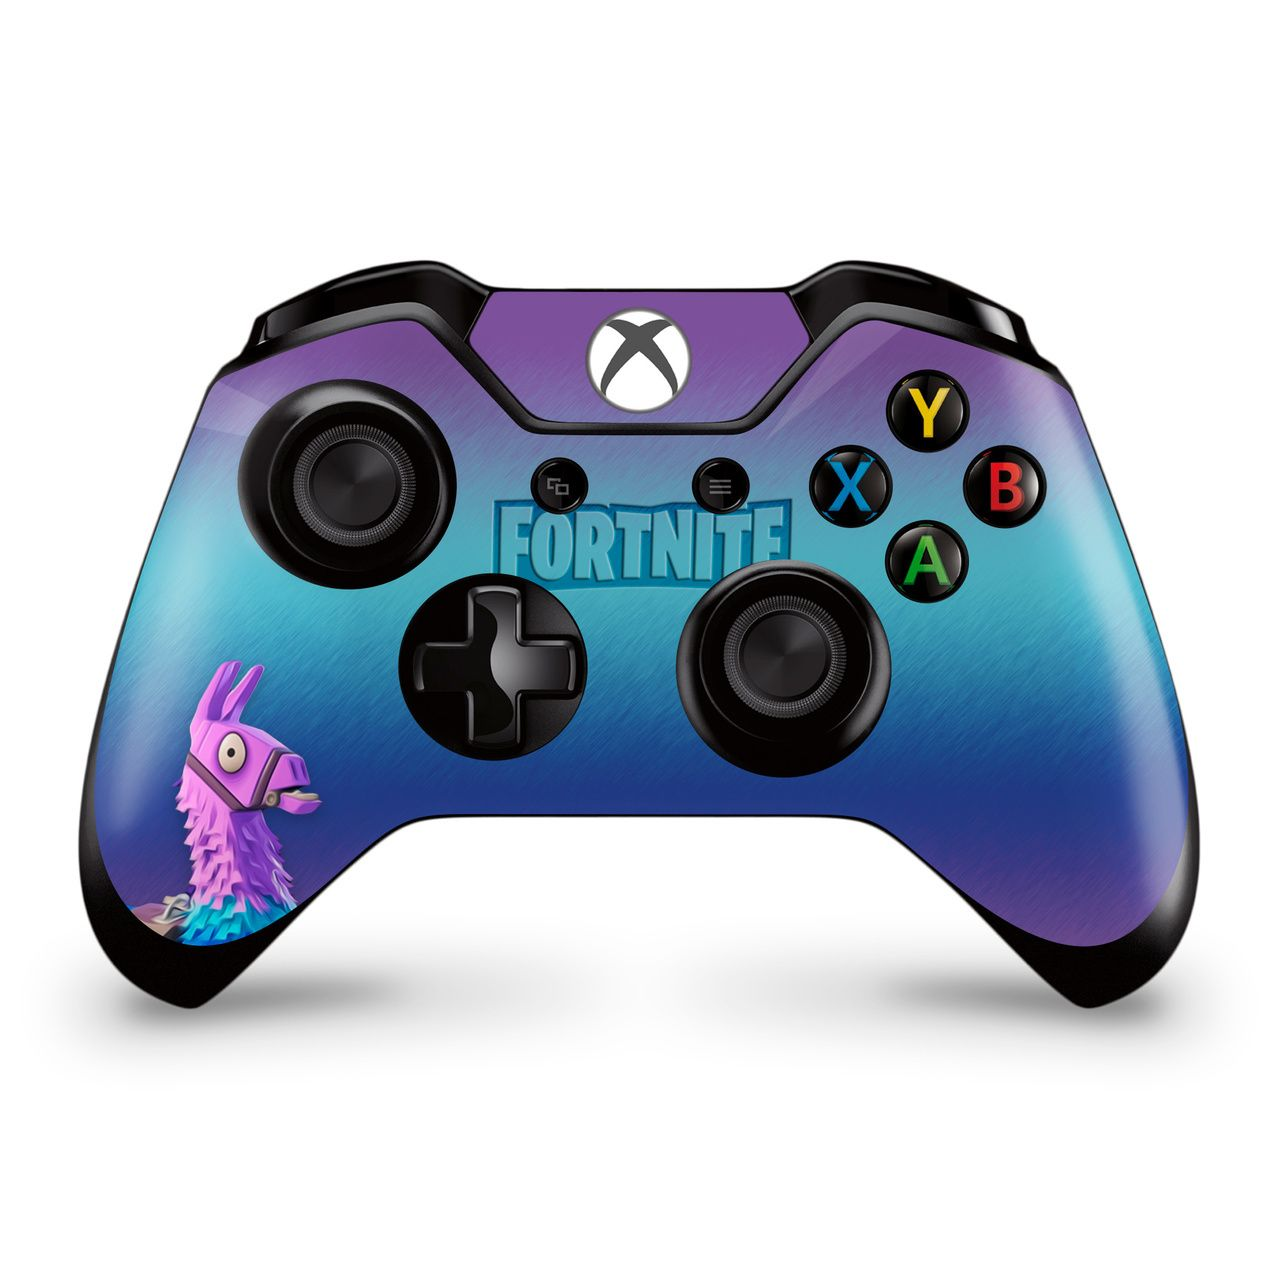 Loot Llama Xbox One Controller Skin Fortnite Xbox One Controller